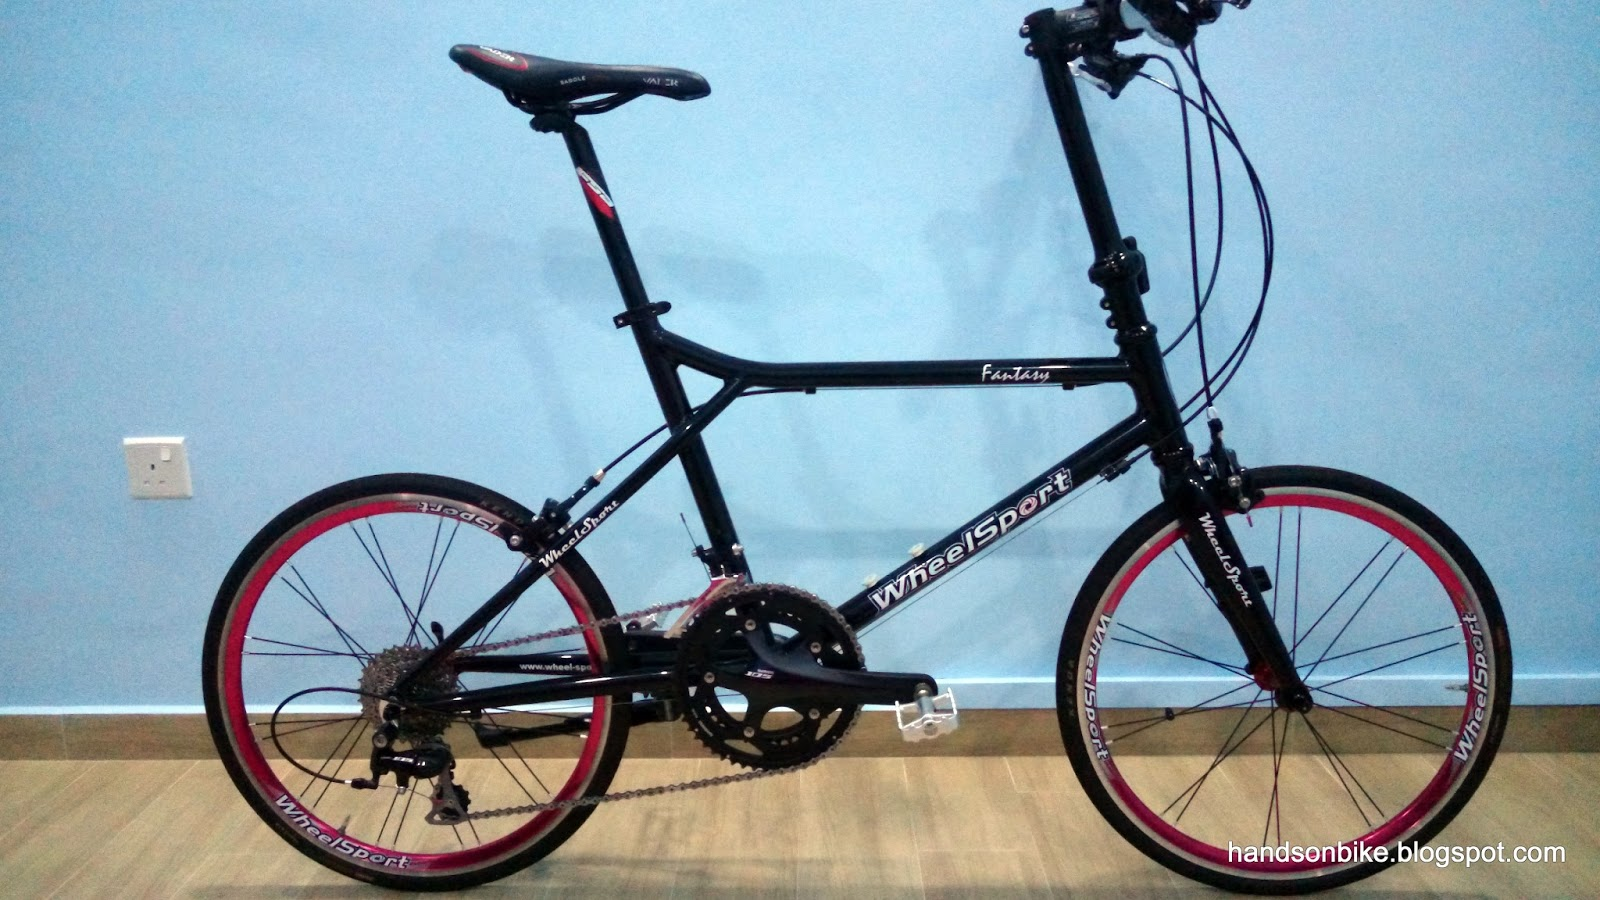 hands on bike wheelsport fantasy mini velo. Black Bedroom Furniture Sets. Home Design Ideas